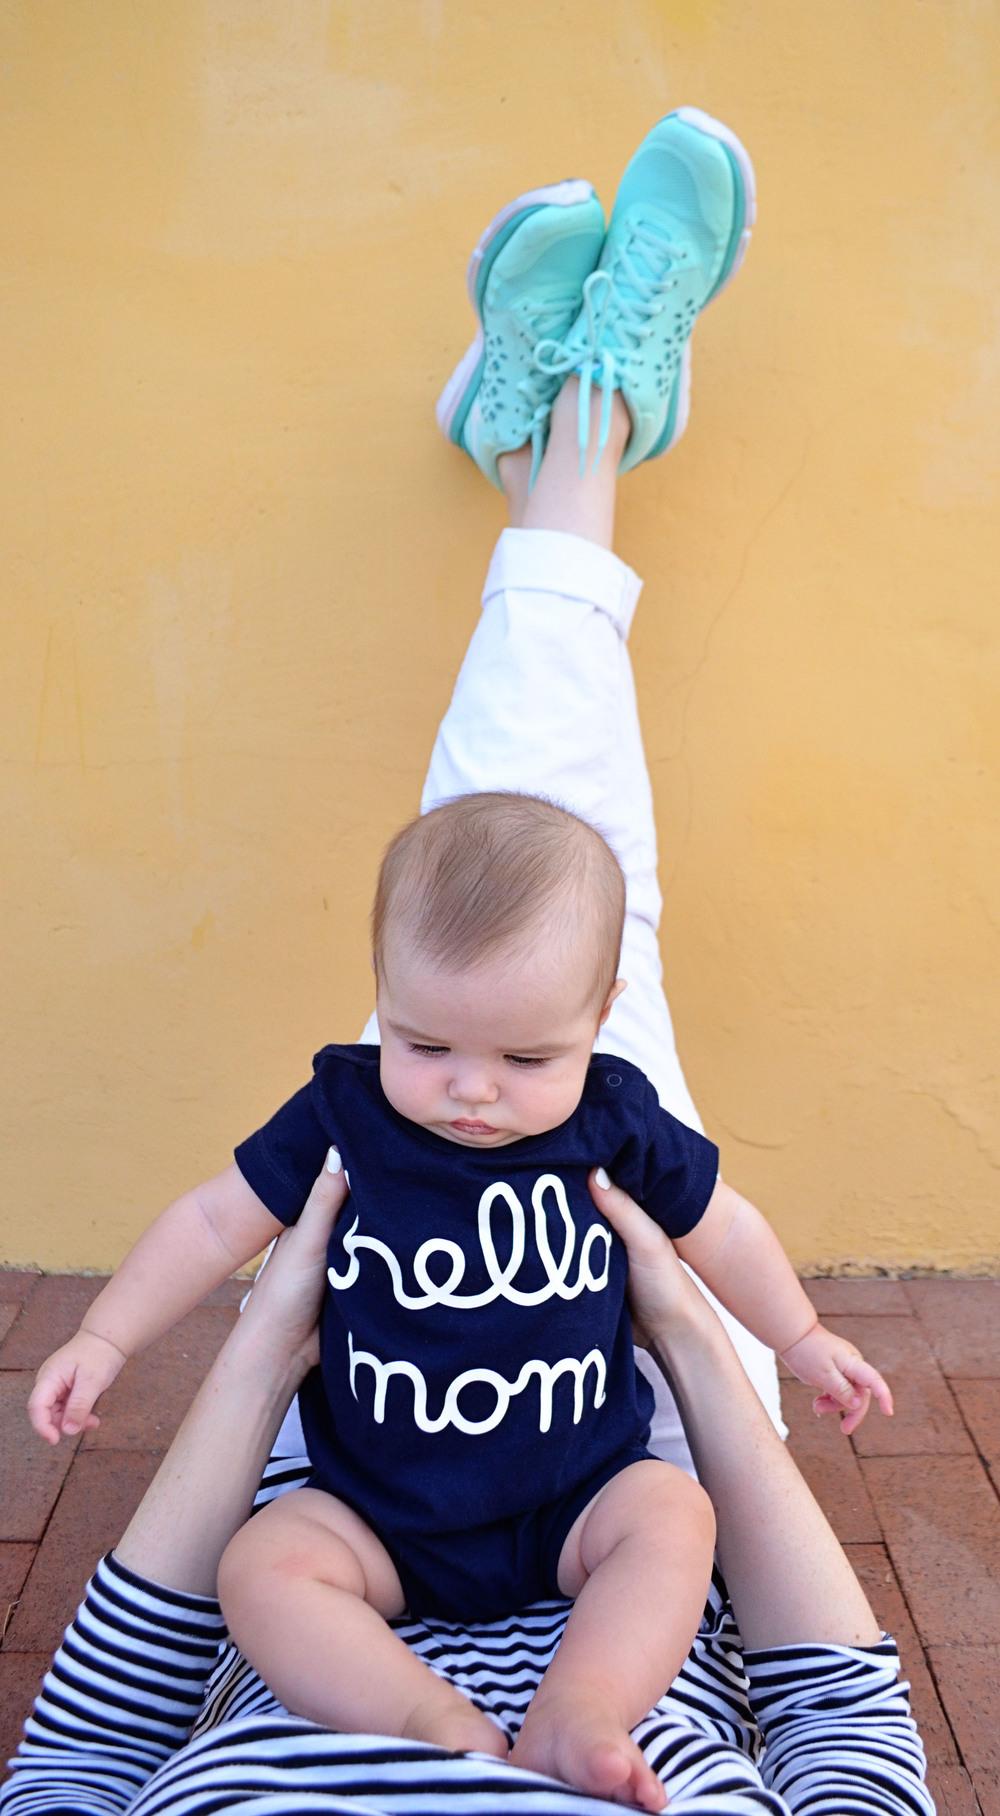 Tucson's Barrios Viejo Family Guide | Momma Society-The Community of Modern Moms | Follow us on Instagram @mommasociety